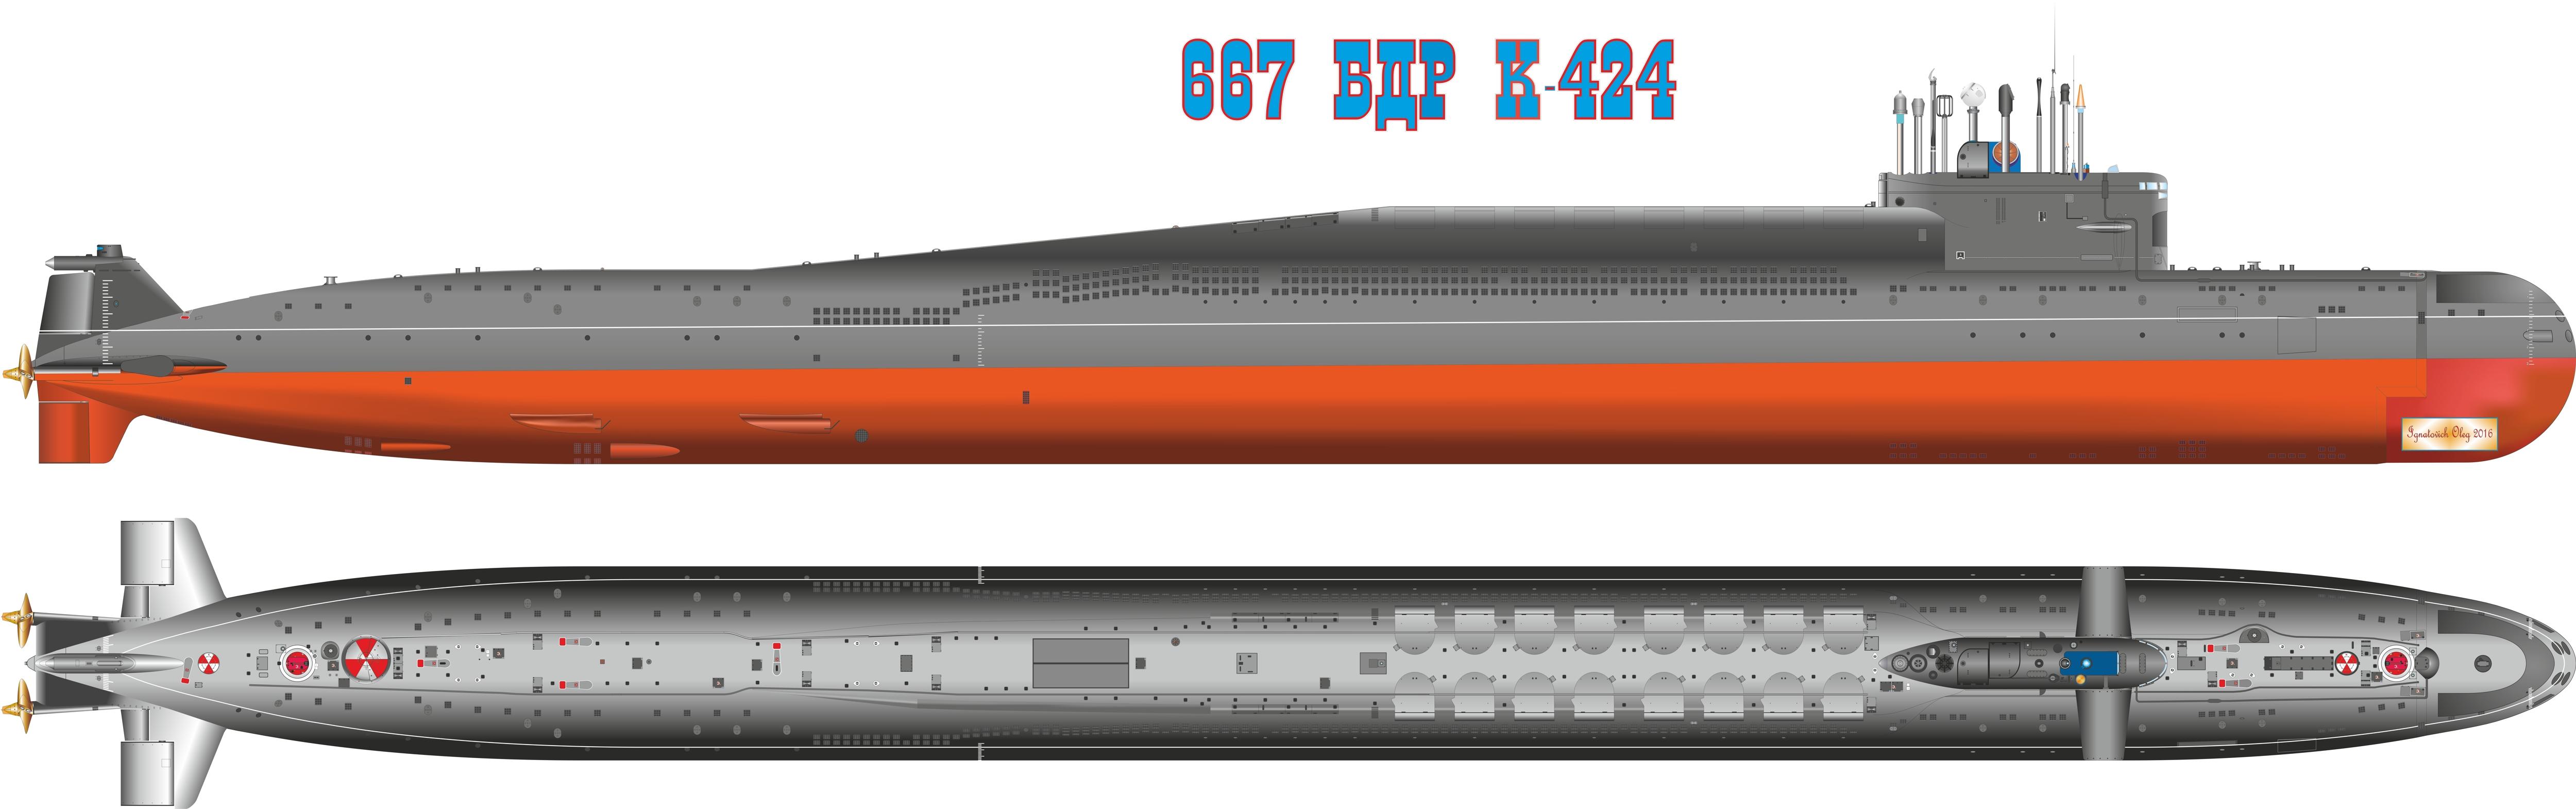 вооружение лодки 667 проекта